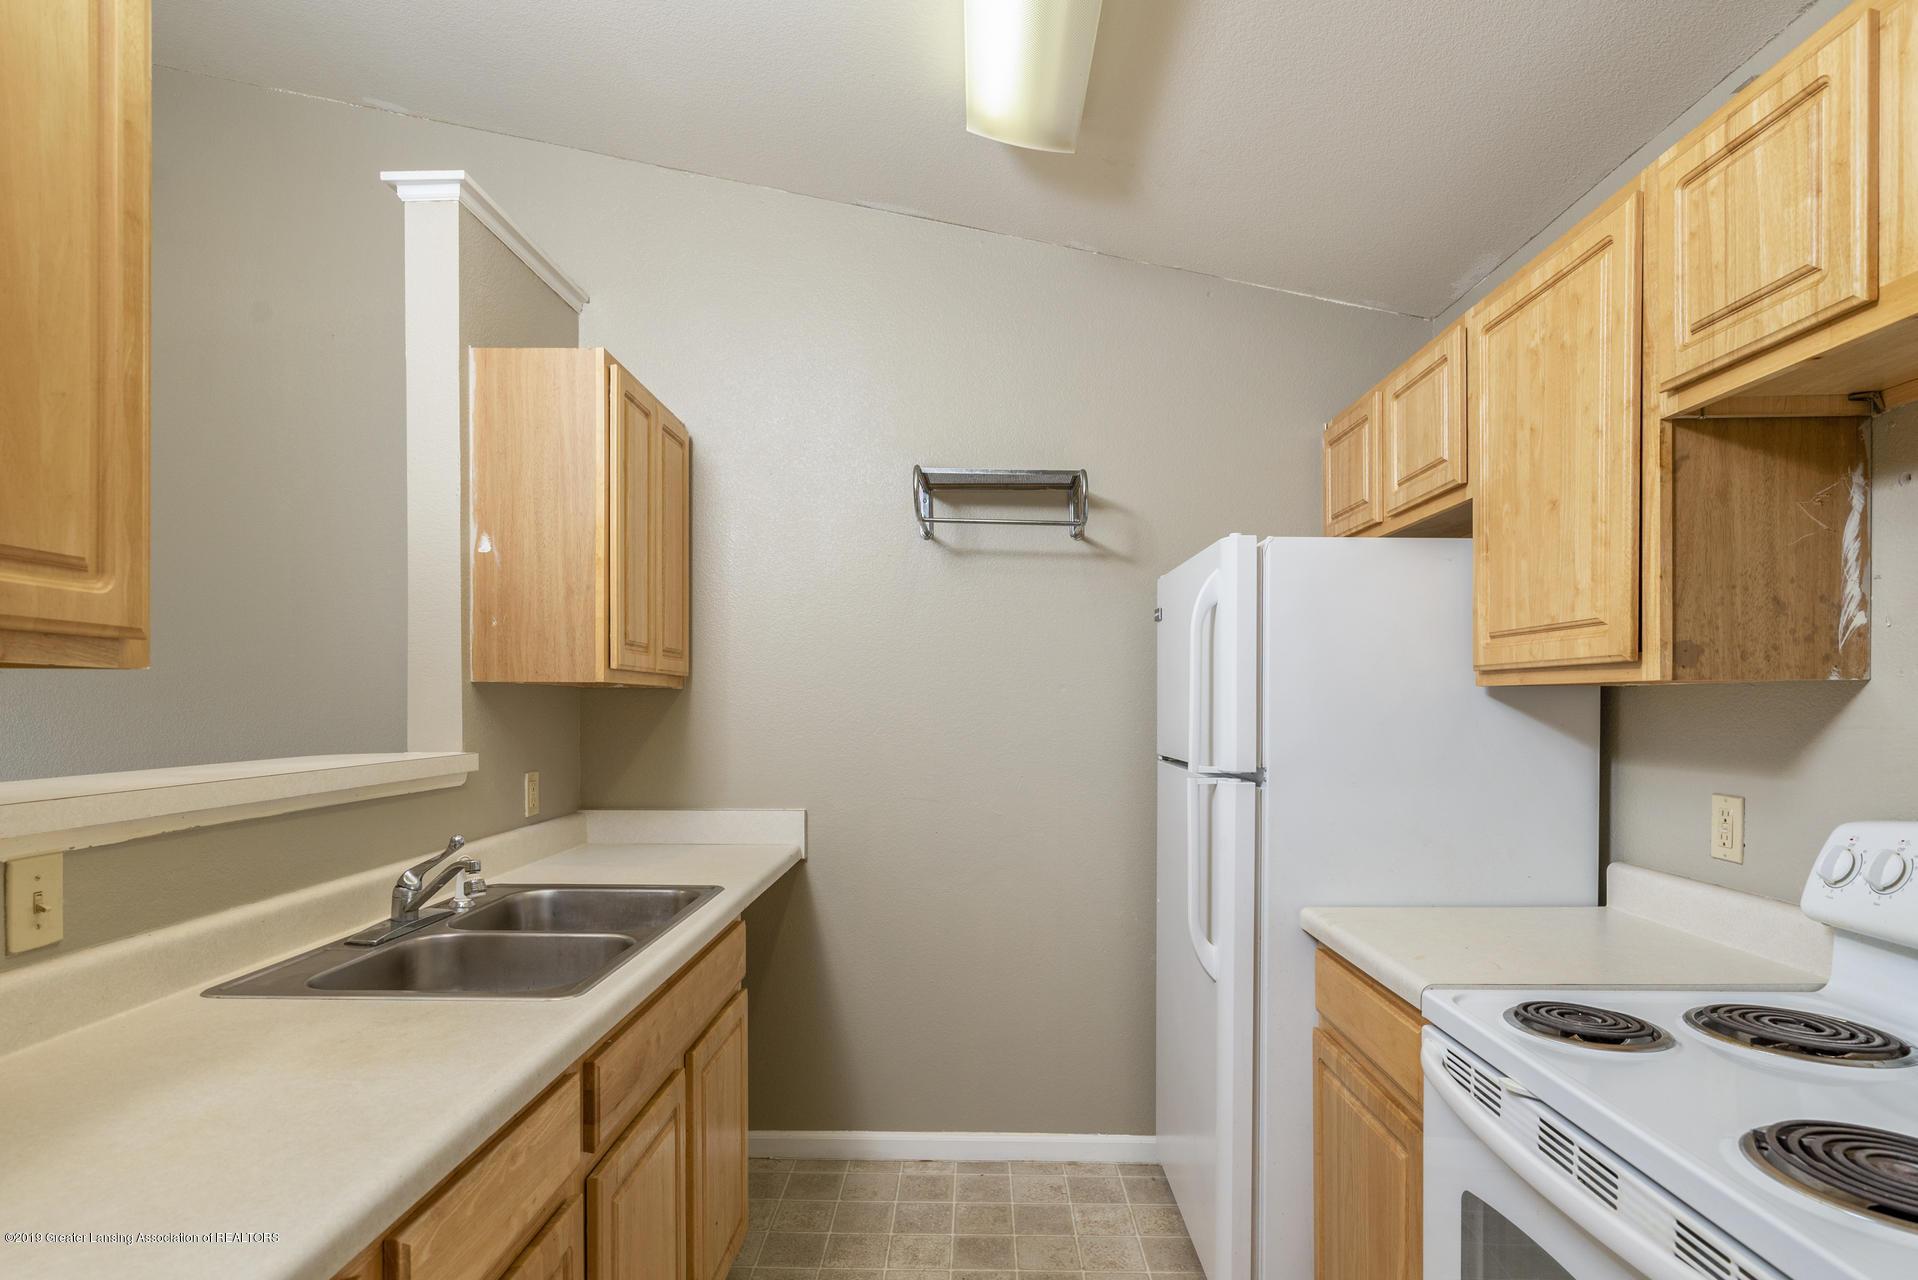 338 W Saginaw St UNIT 44 - 007-photo-kitchen-7483698 - 8